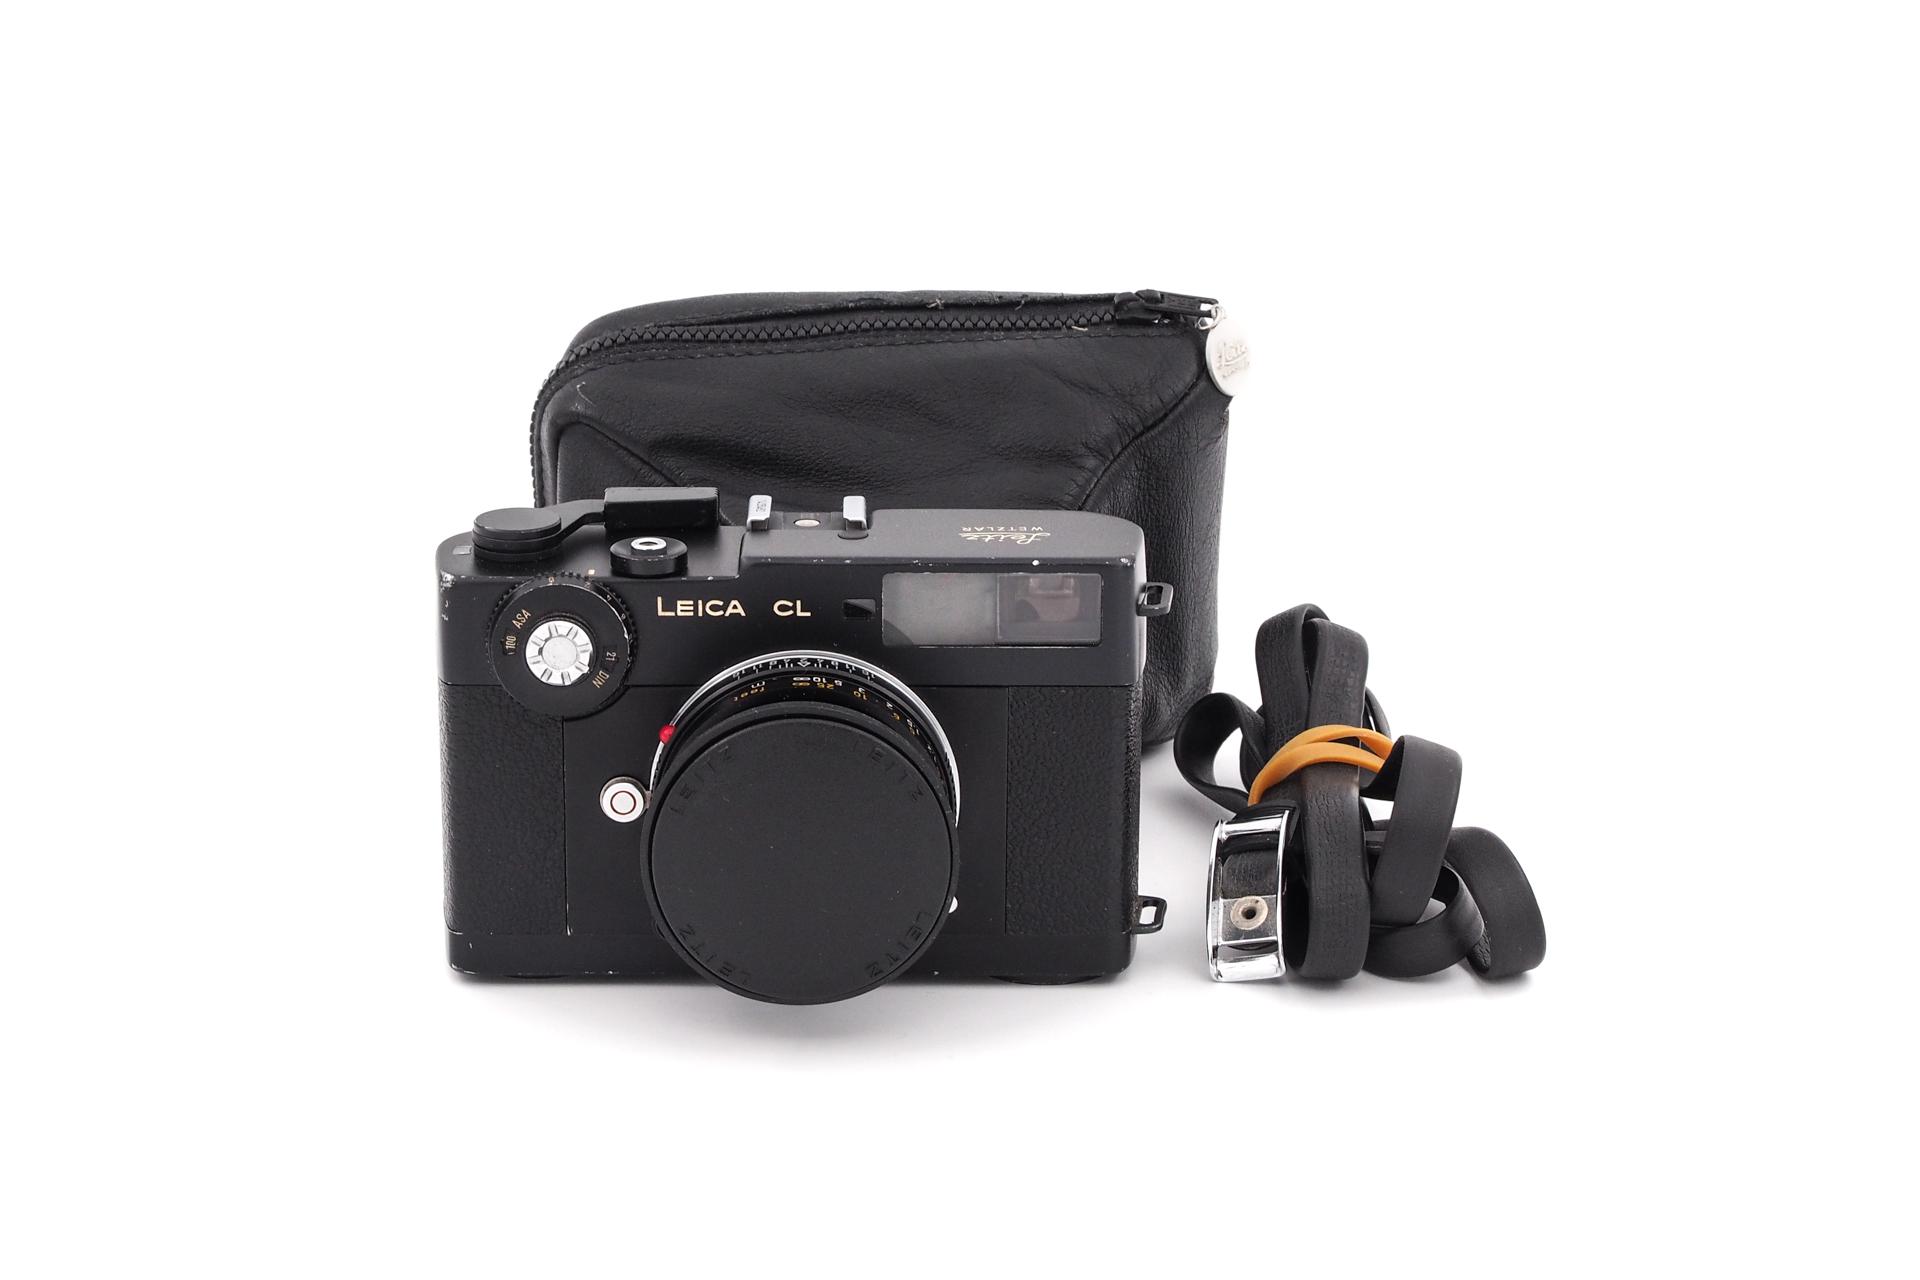 Leica CL + Summicron-C 40mm F/2